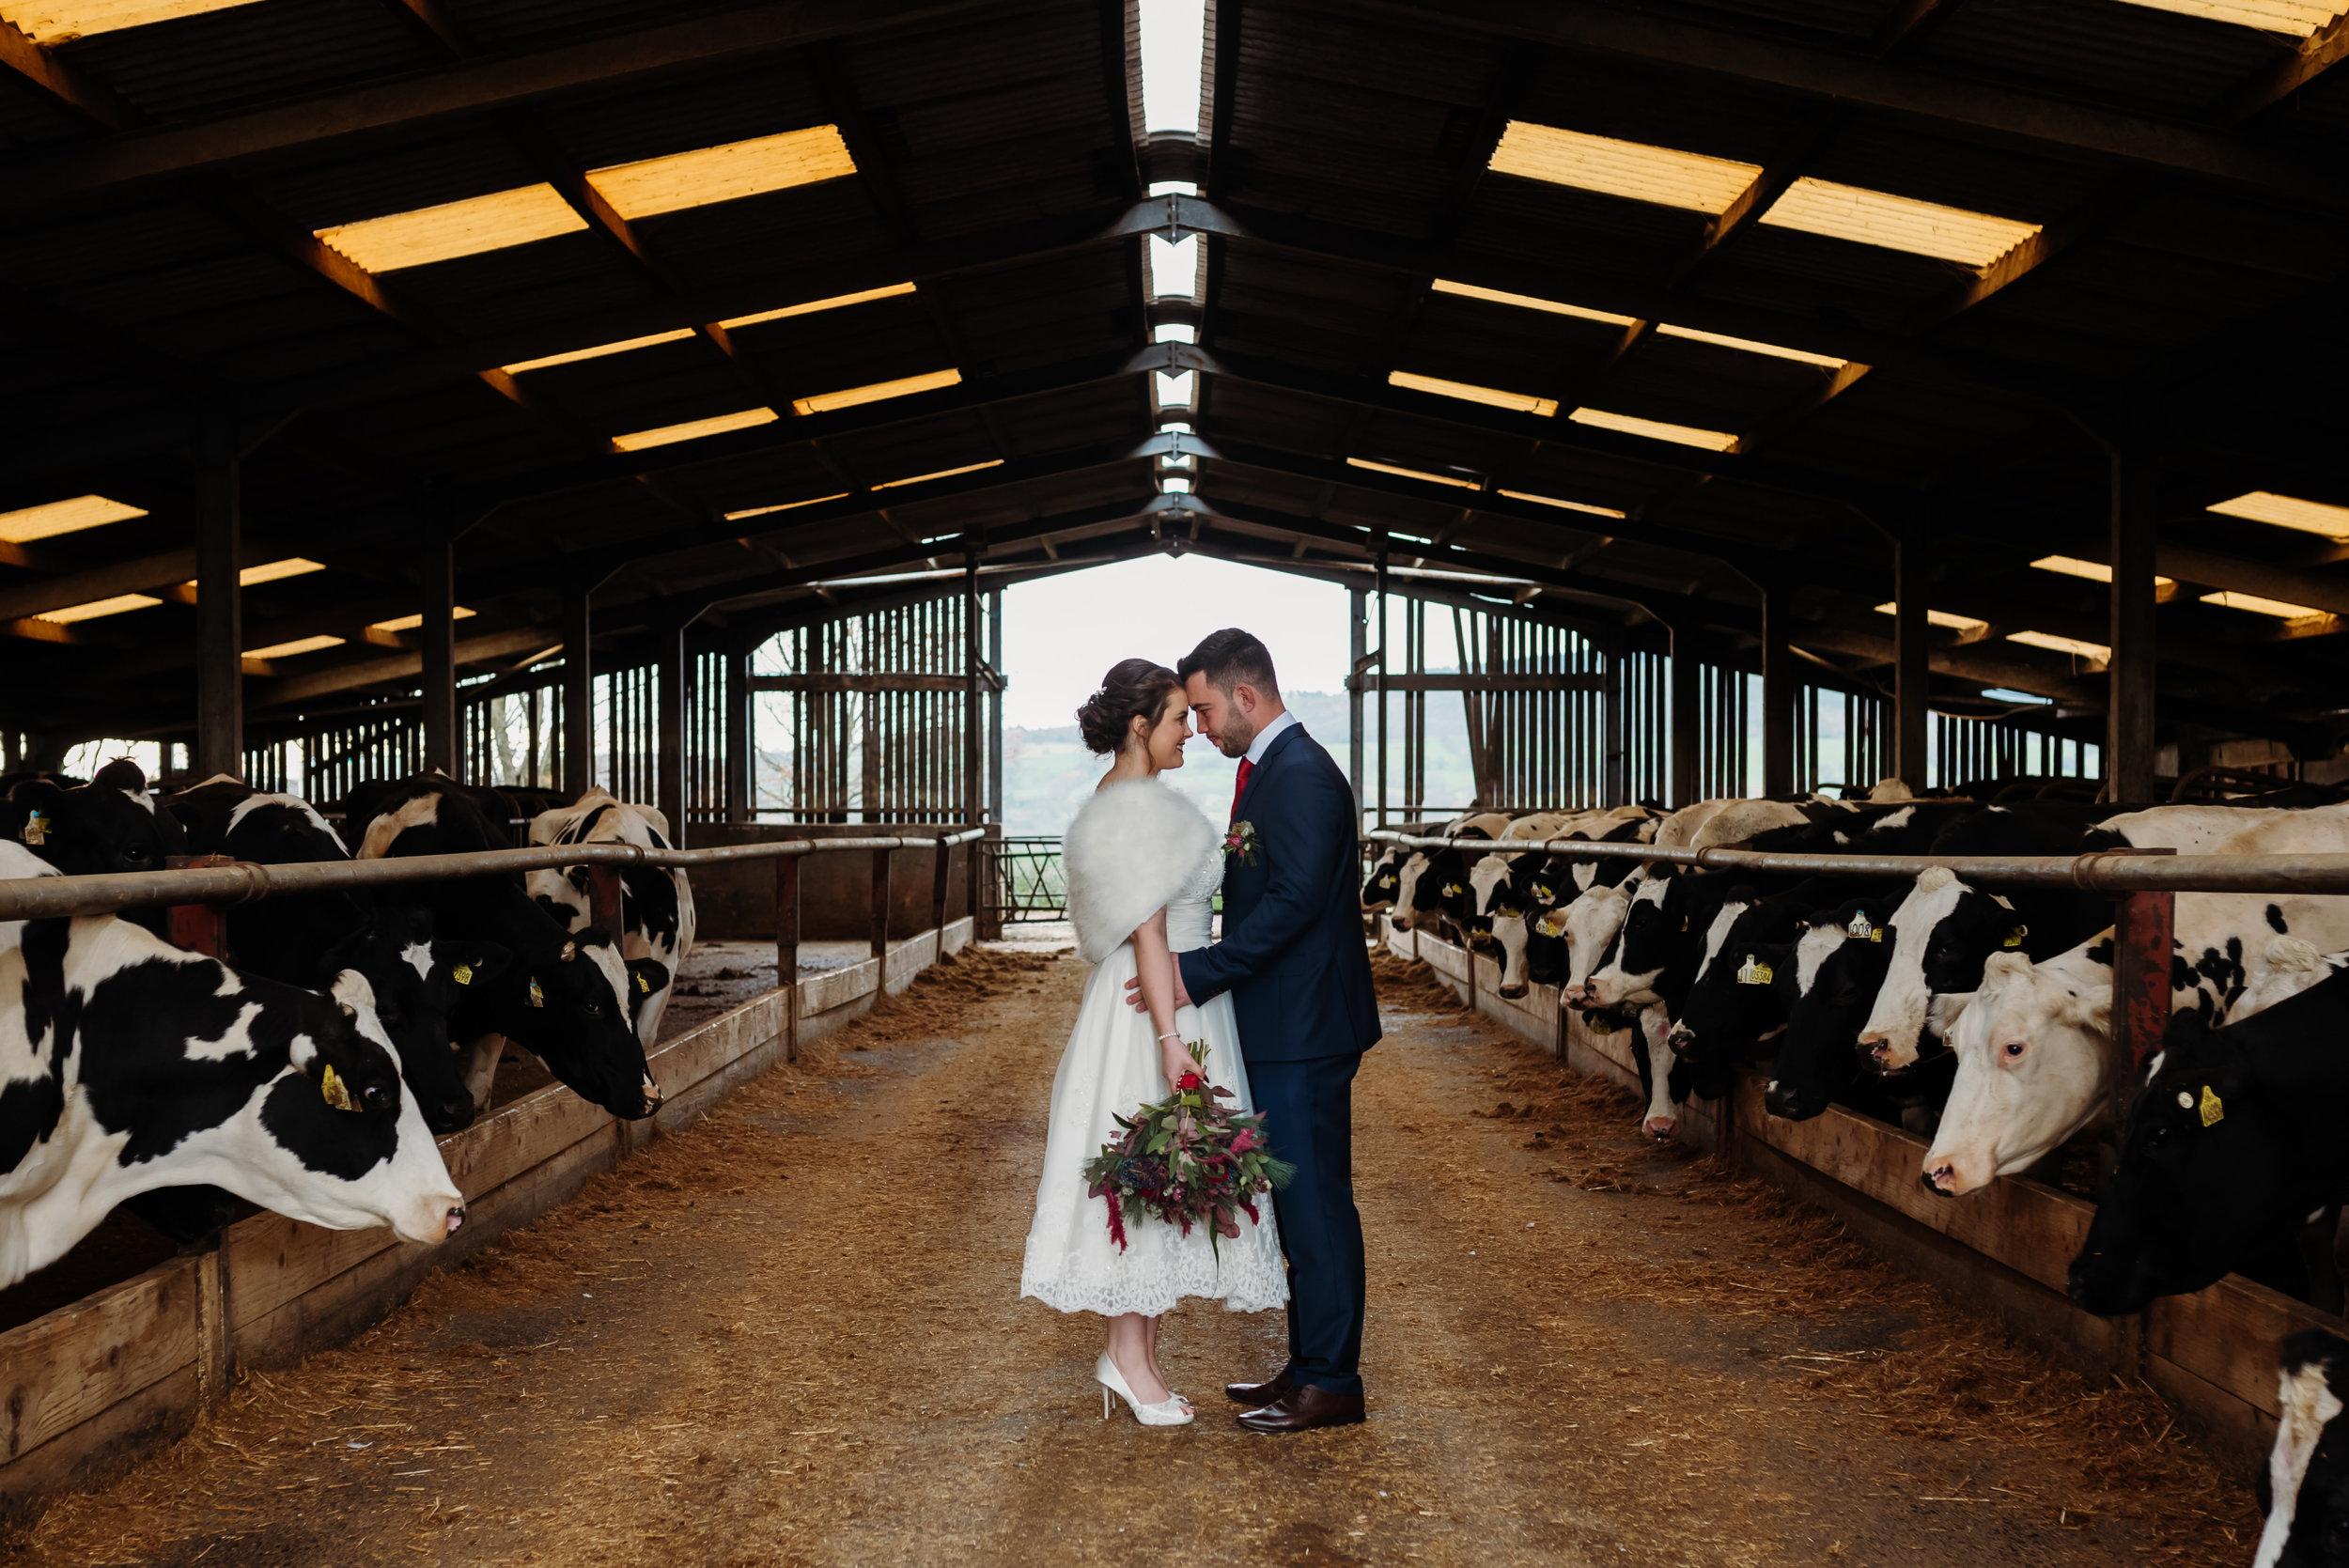 Bashall Barn wedding  - cow shed